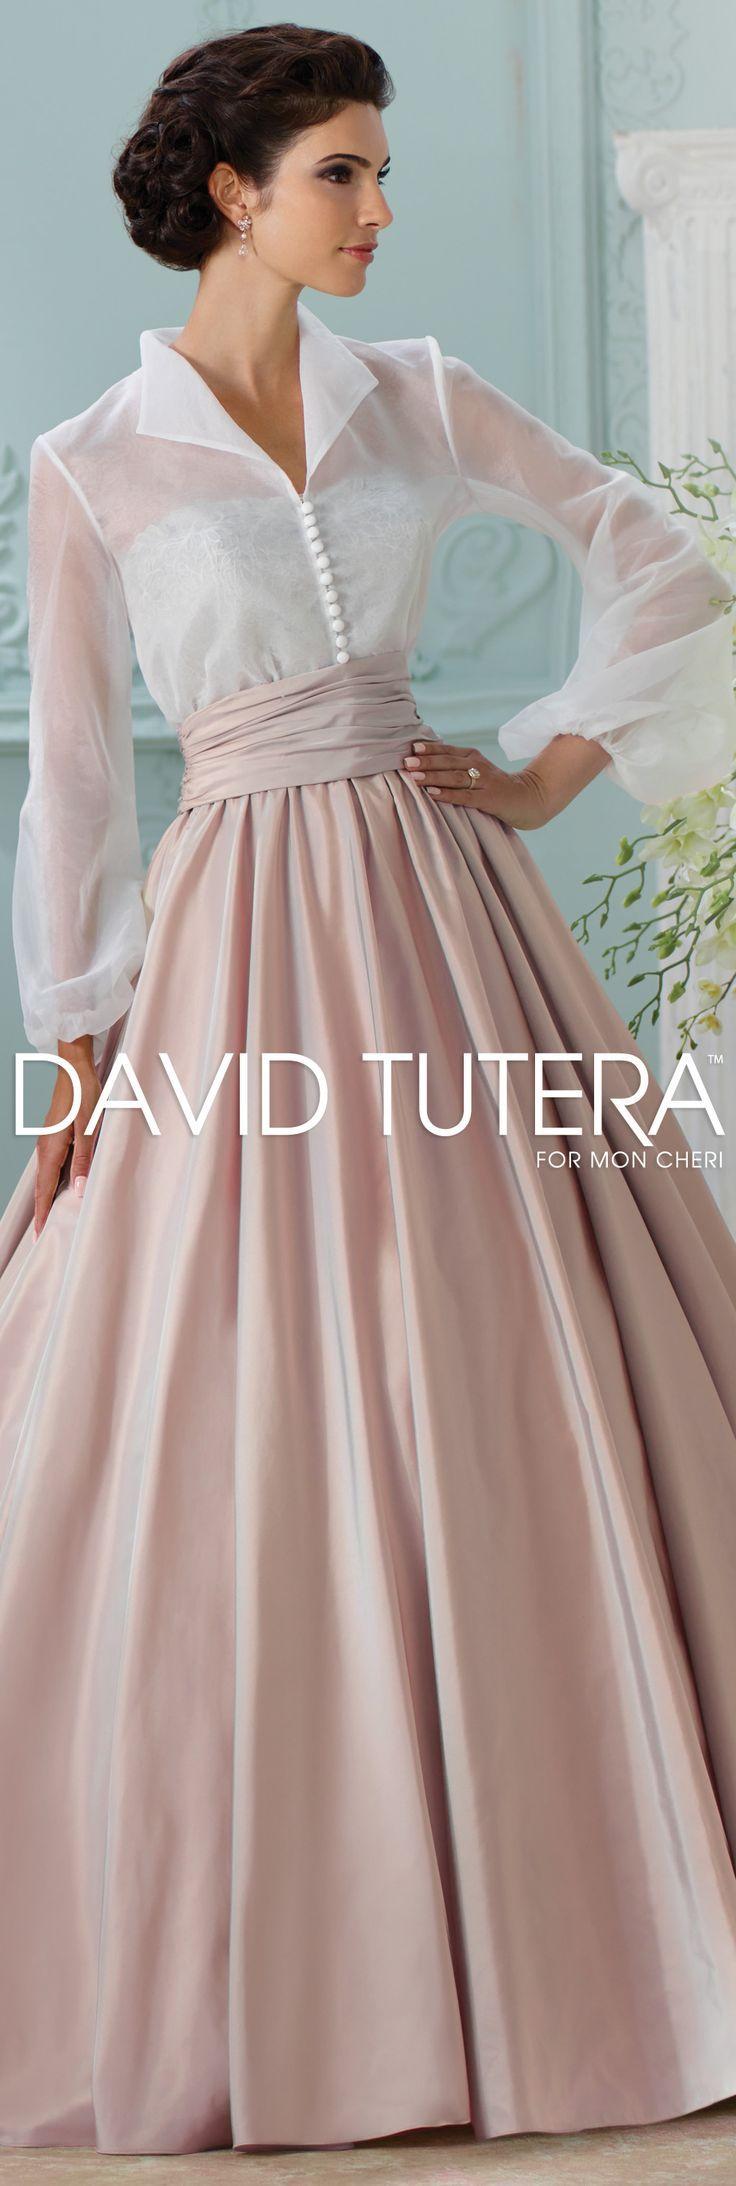 David Tutera for Mon Cheri Collection | kurz-lange Abendkleider ...